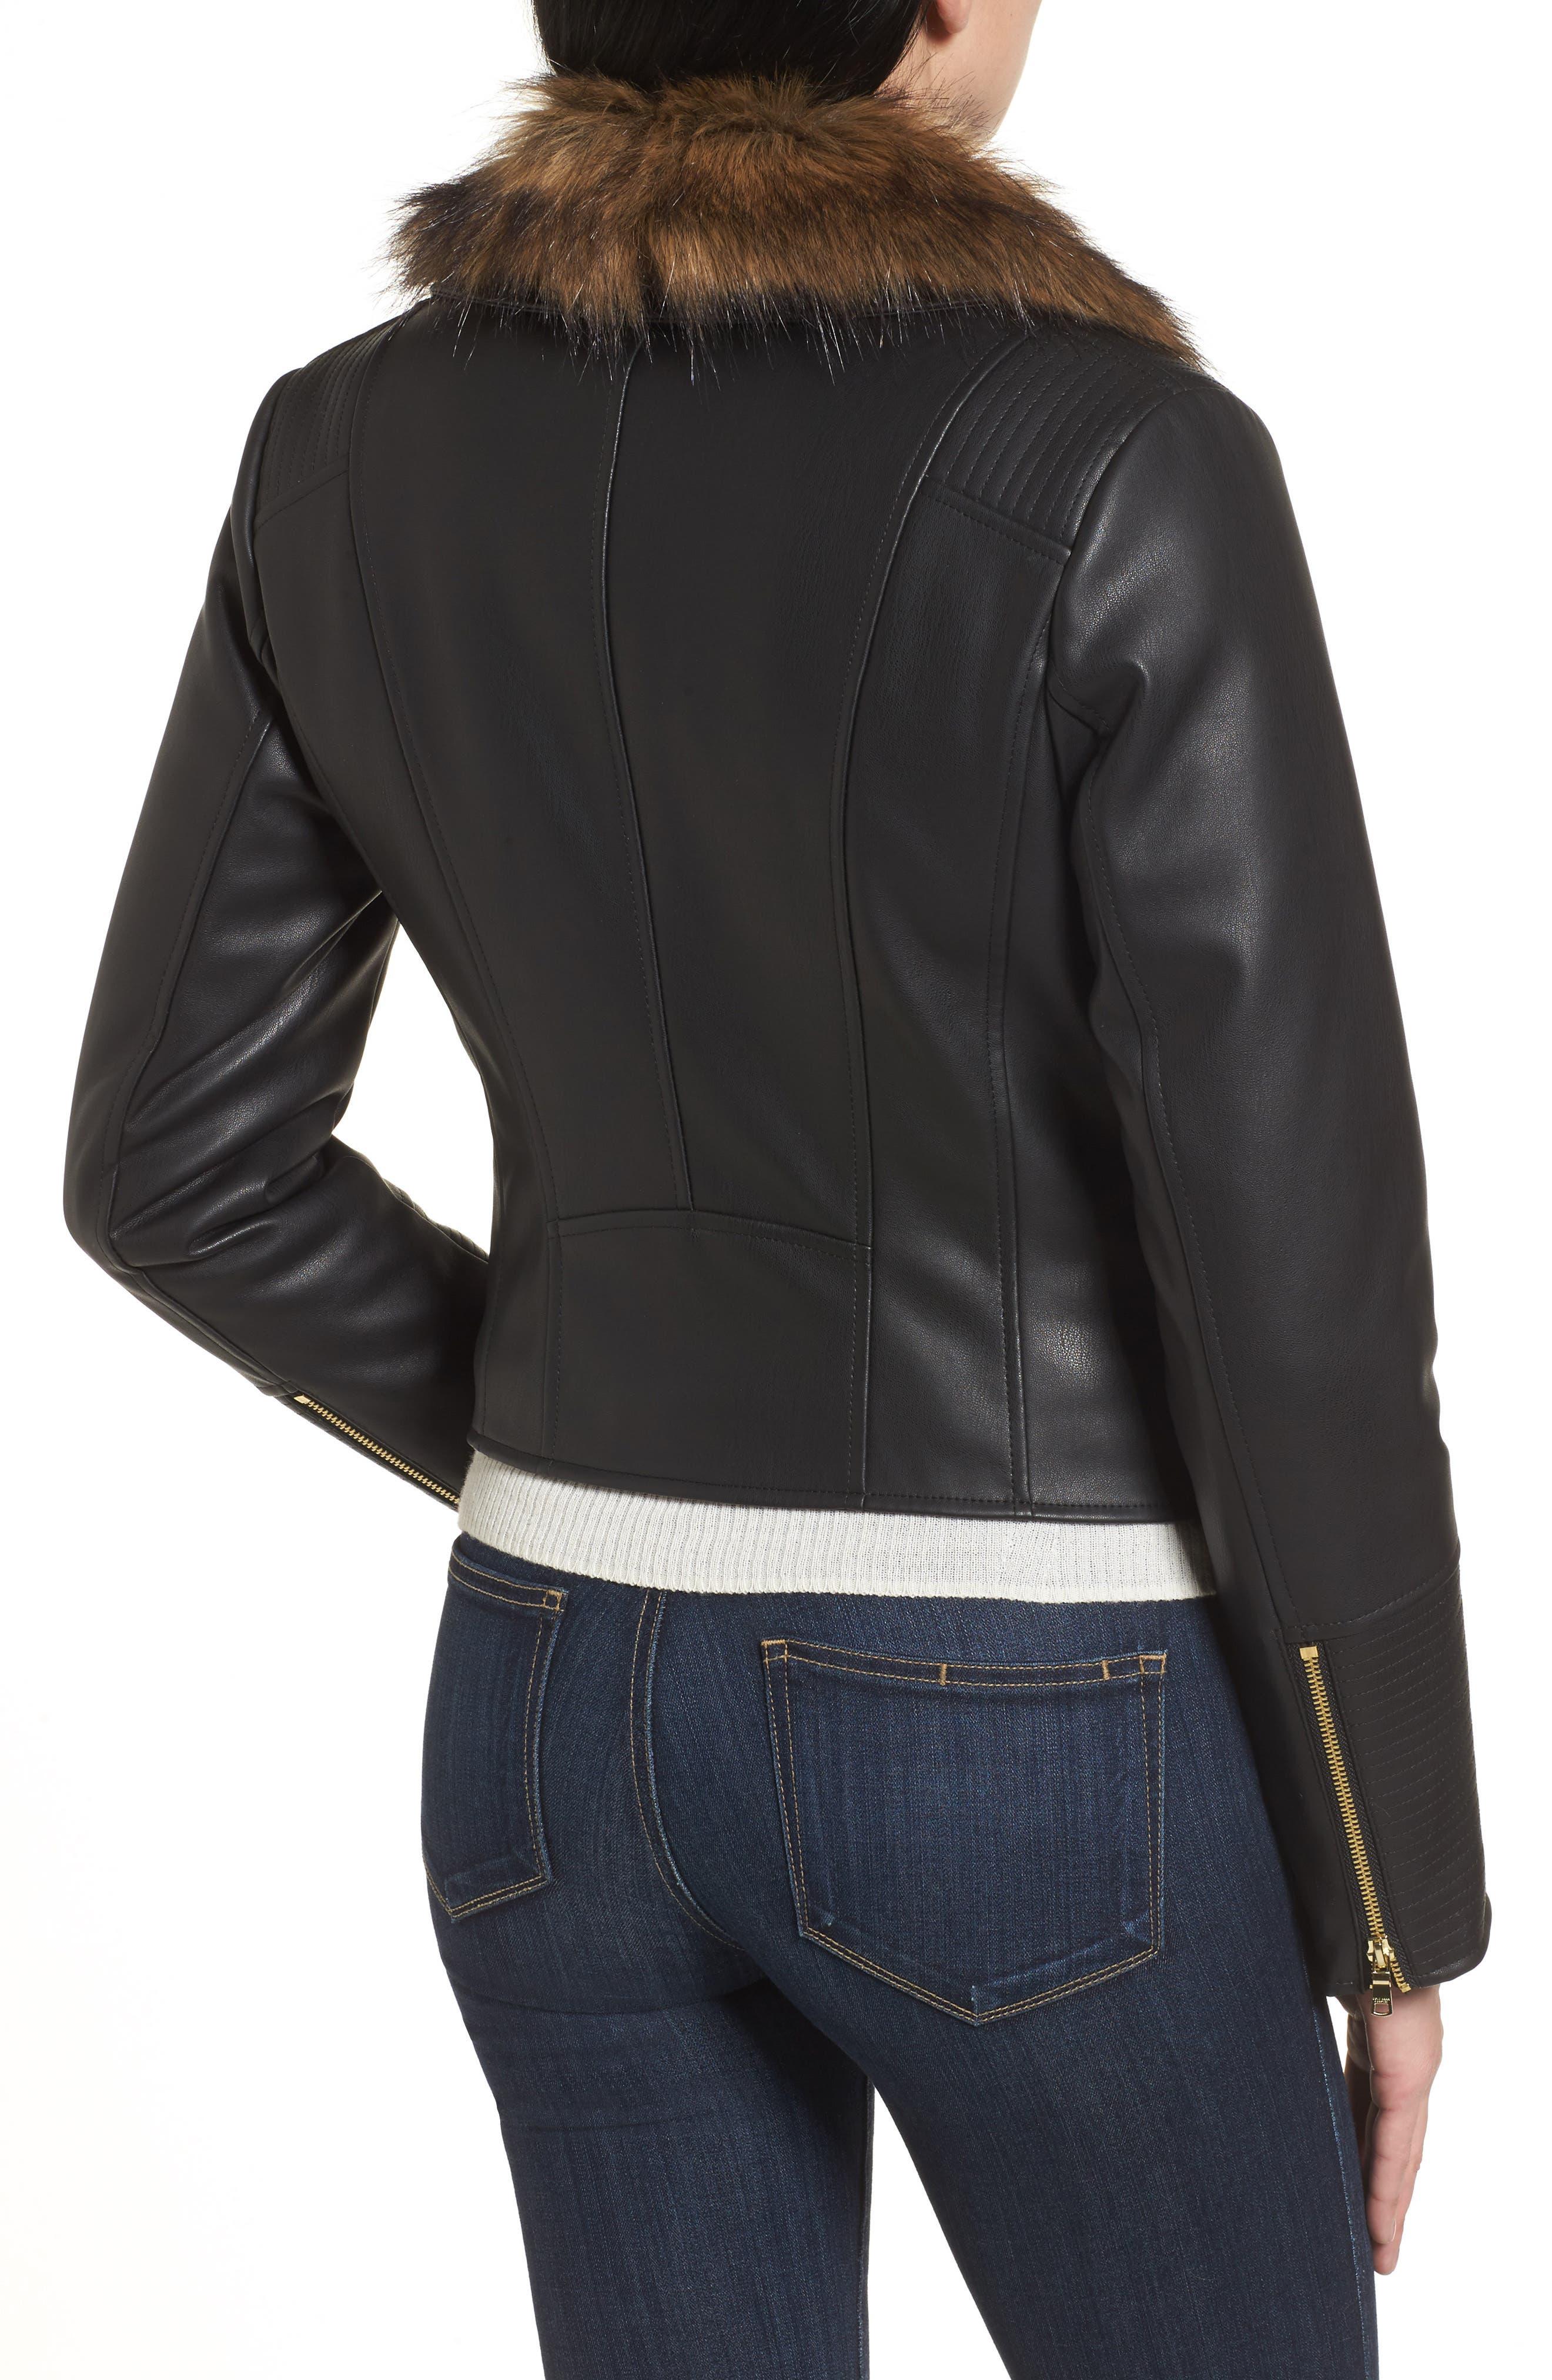 Alternate Image 2  - Cole Haan Signature Faux Leather Jacket with Detachable Faux Fur